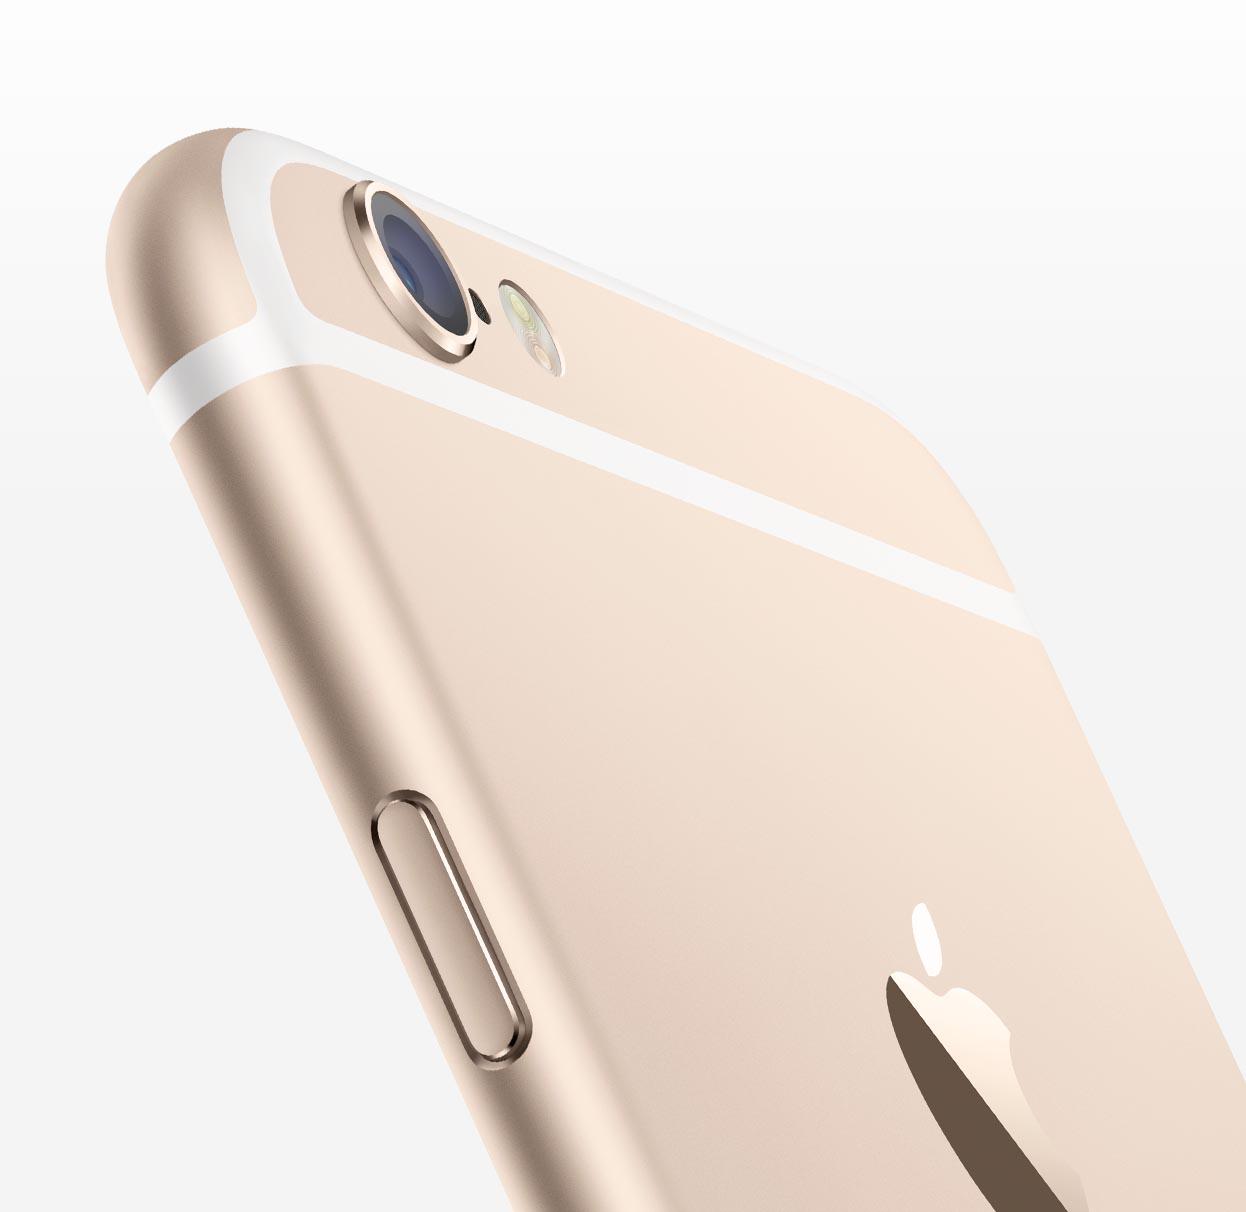 ¿Apple acaba con las cámaras fotográficas?